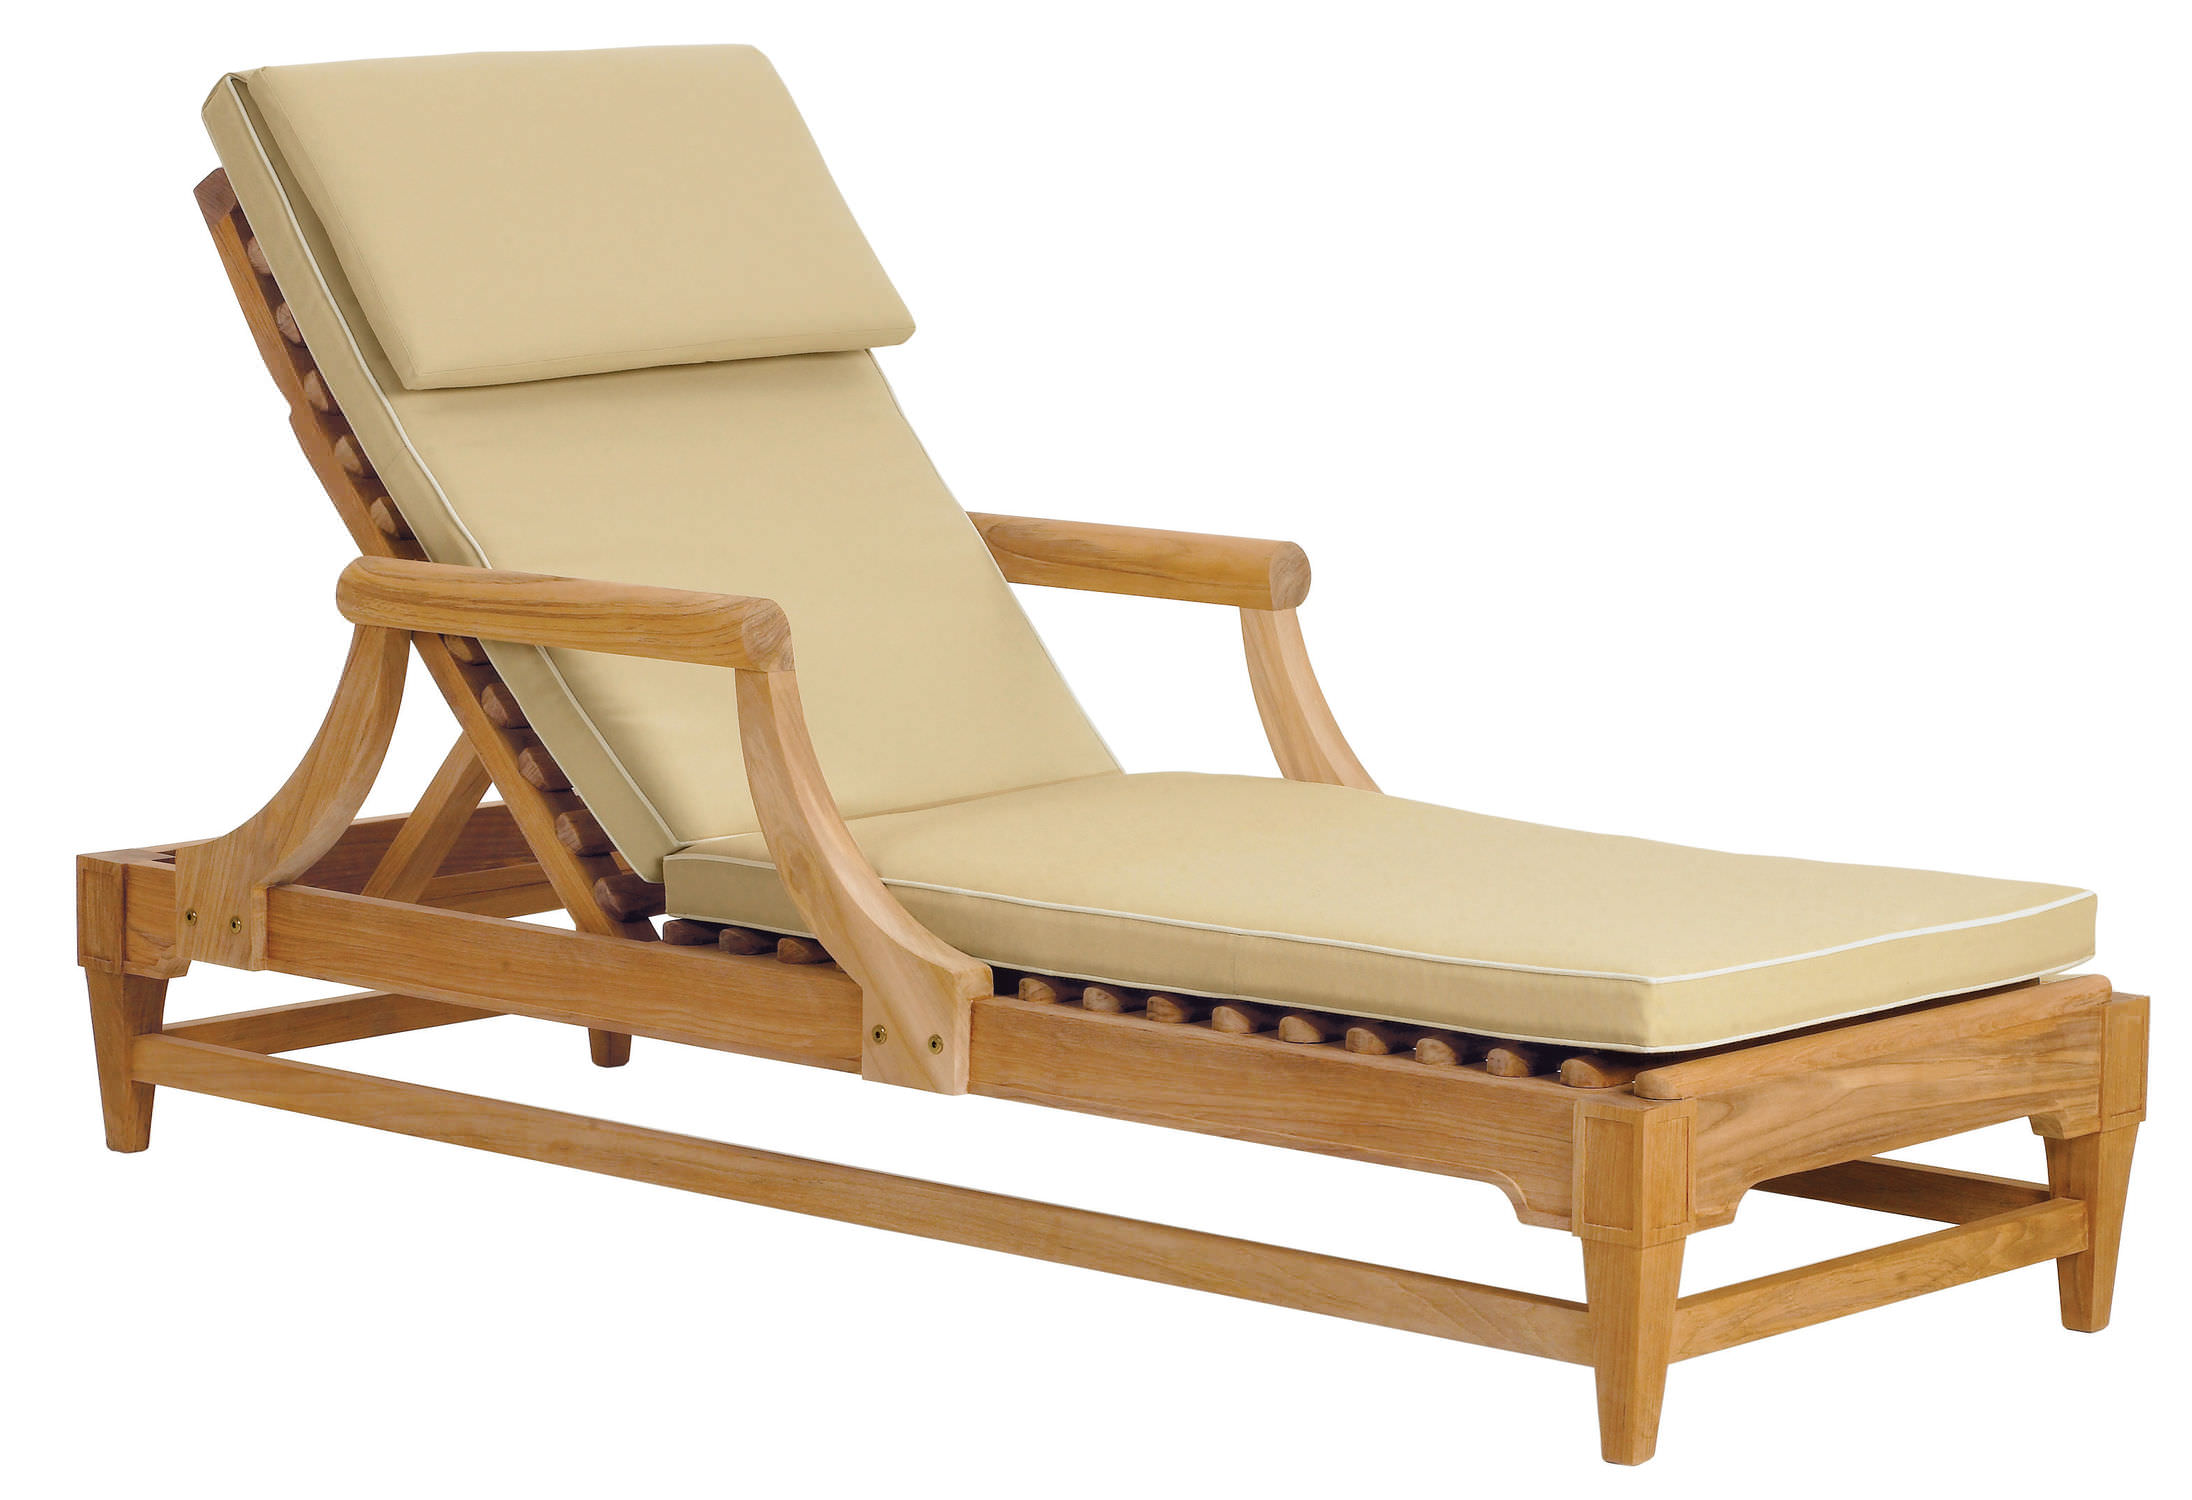 Traditional Sun Lounger / Wooden / Garden / Adjustable Backrest ...